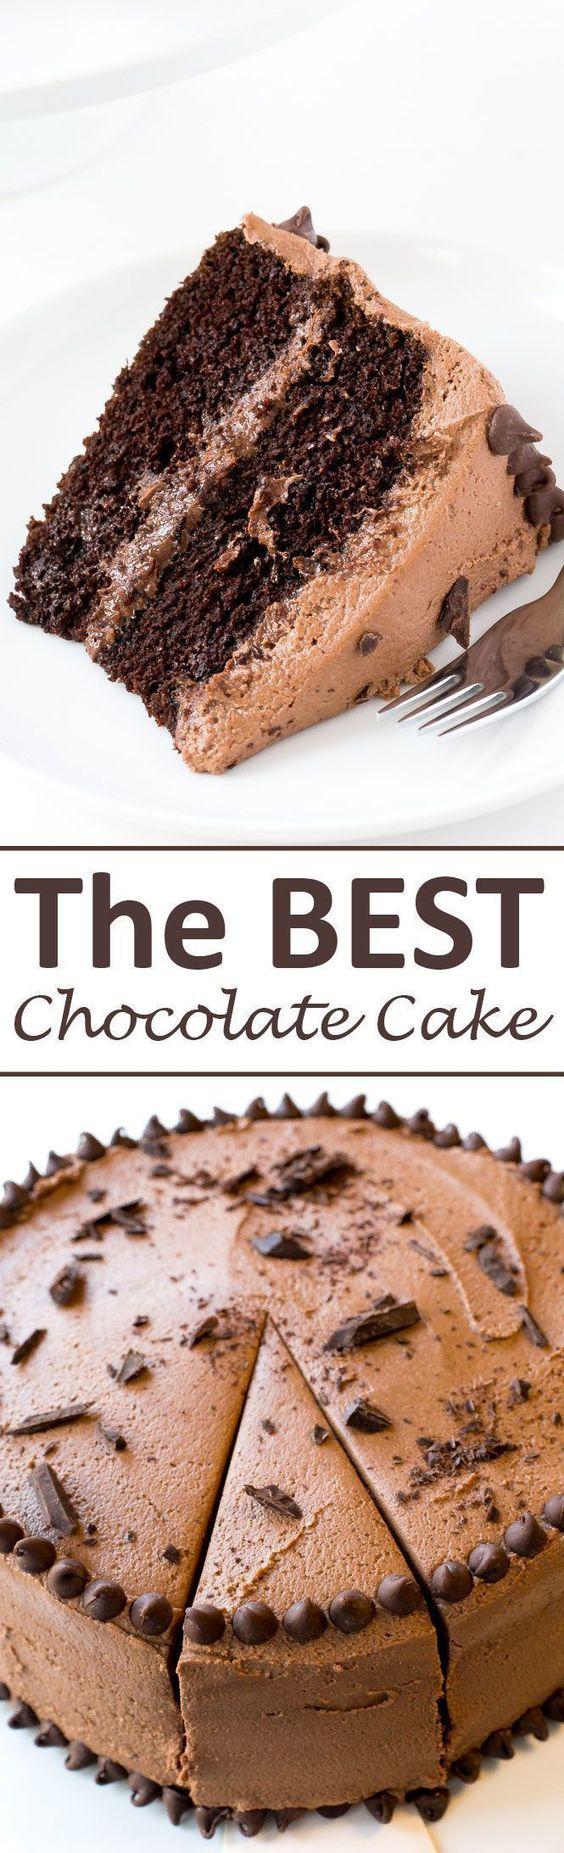 Ina garten chocolate cake frosting recipe - Food fast recipes